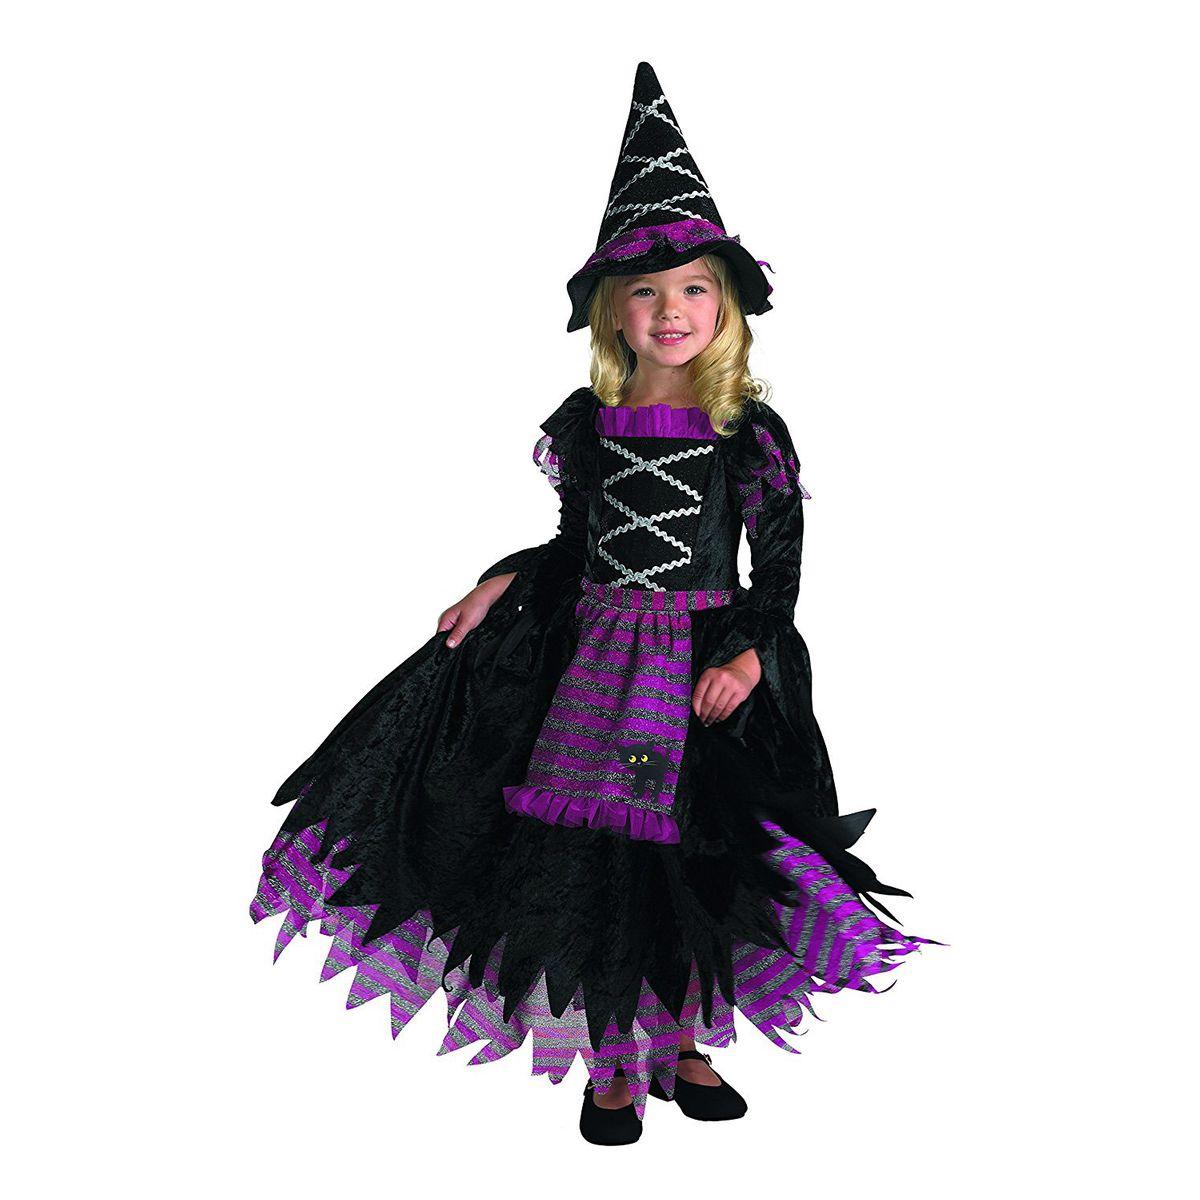 27 Best Halloween Costumes For Kids 2020 The Strategist New York Magazine